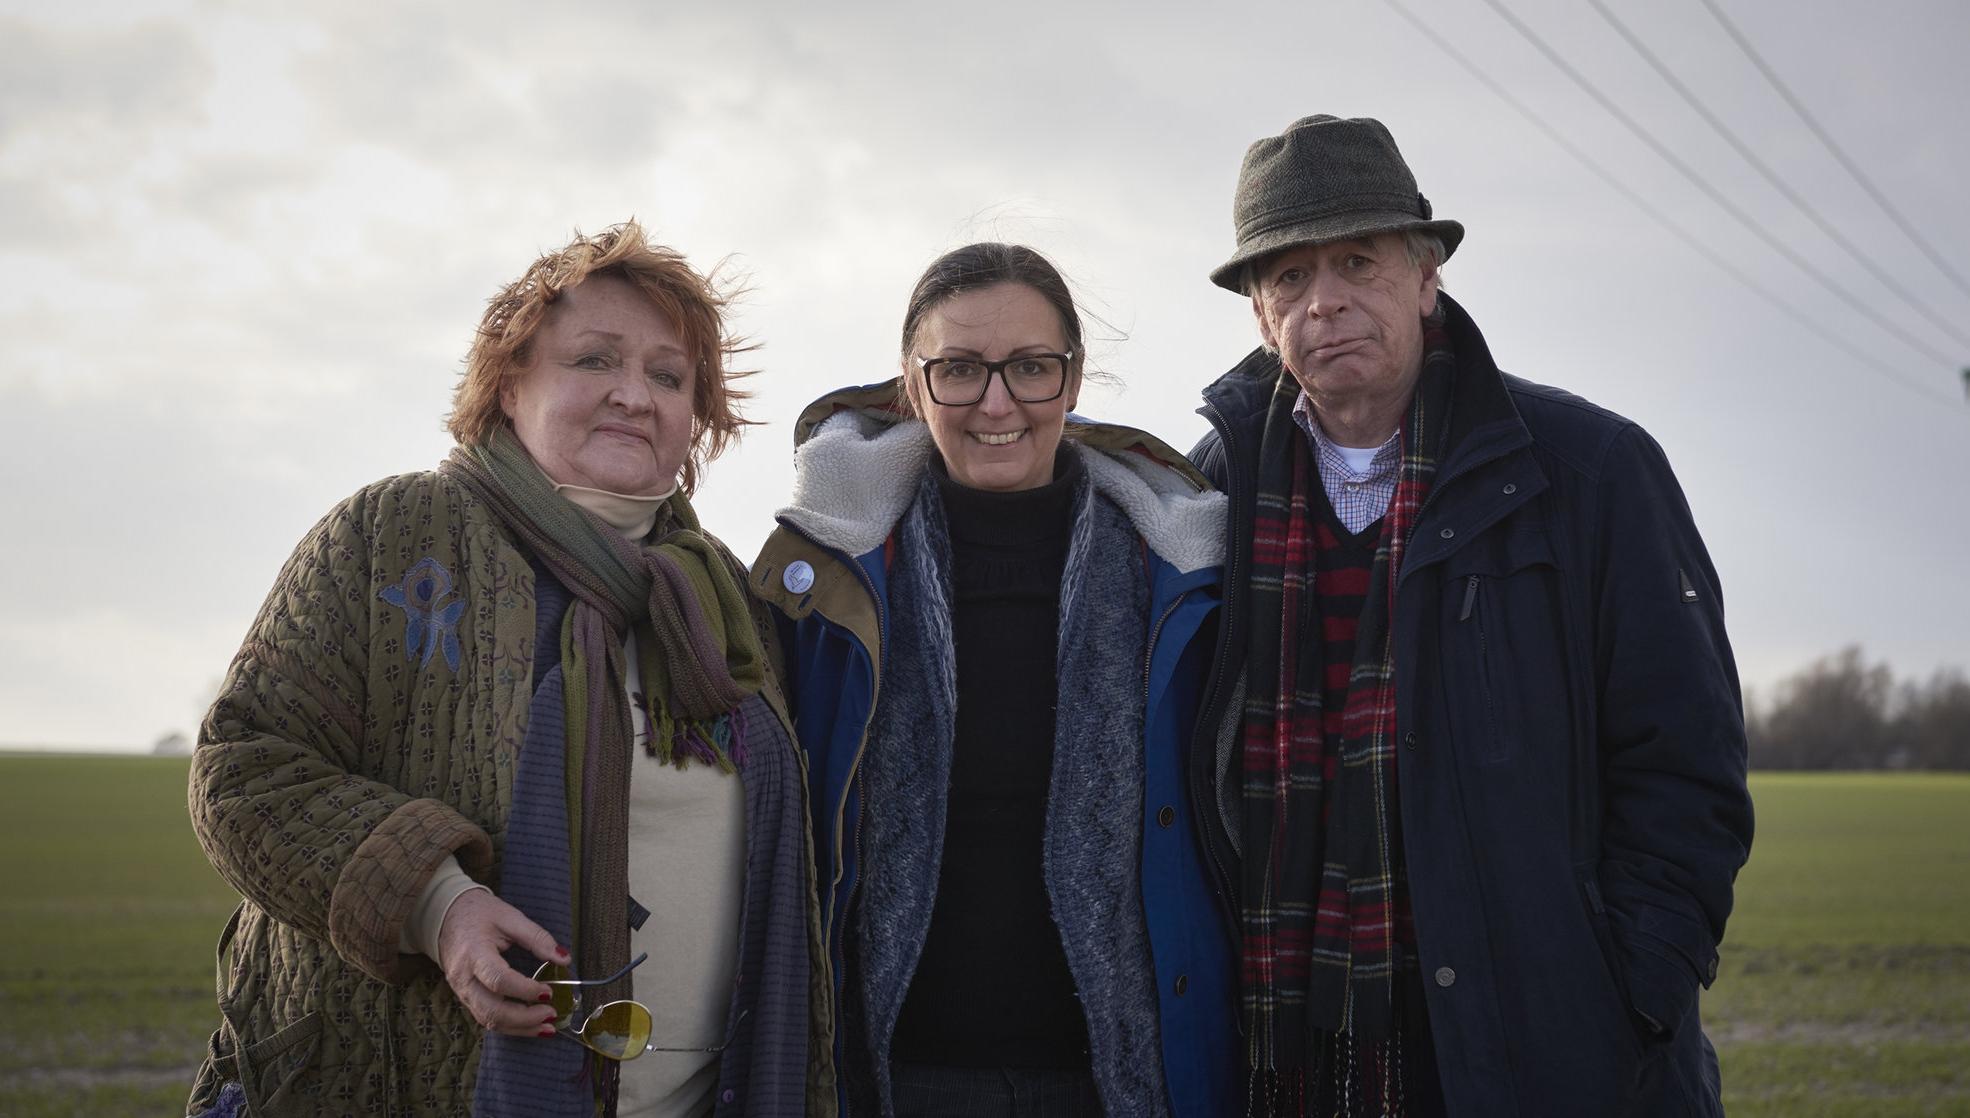 Marianne Mörck, Thérèse Ahlbeck och Kryddan Peterson.